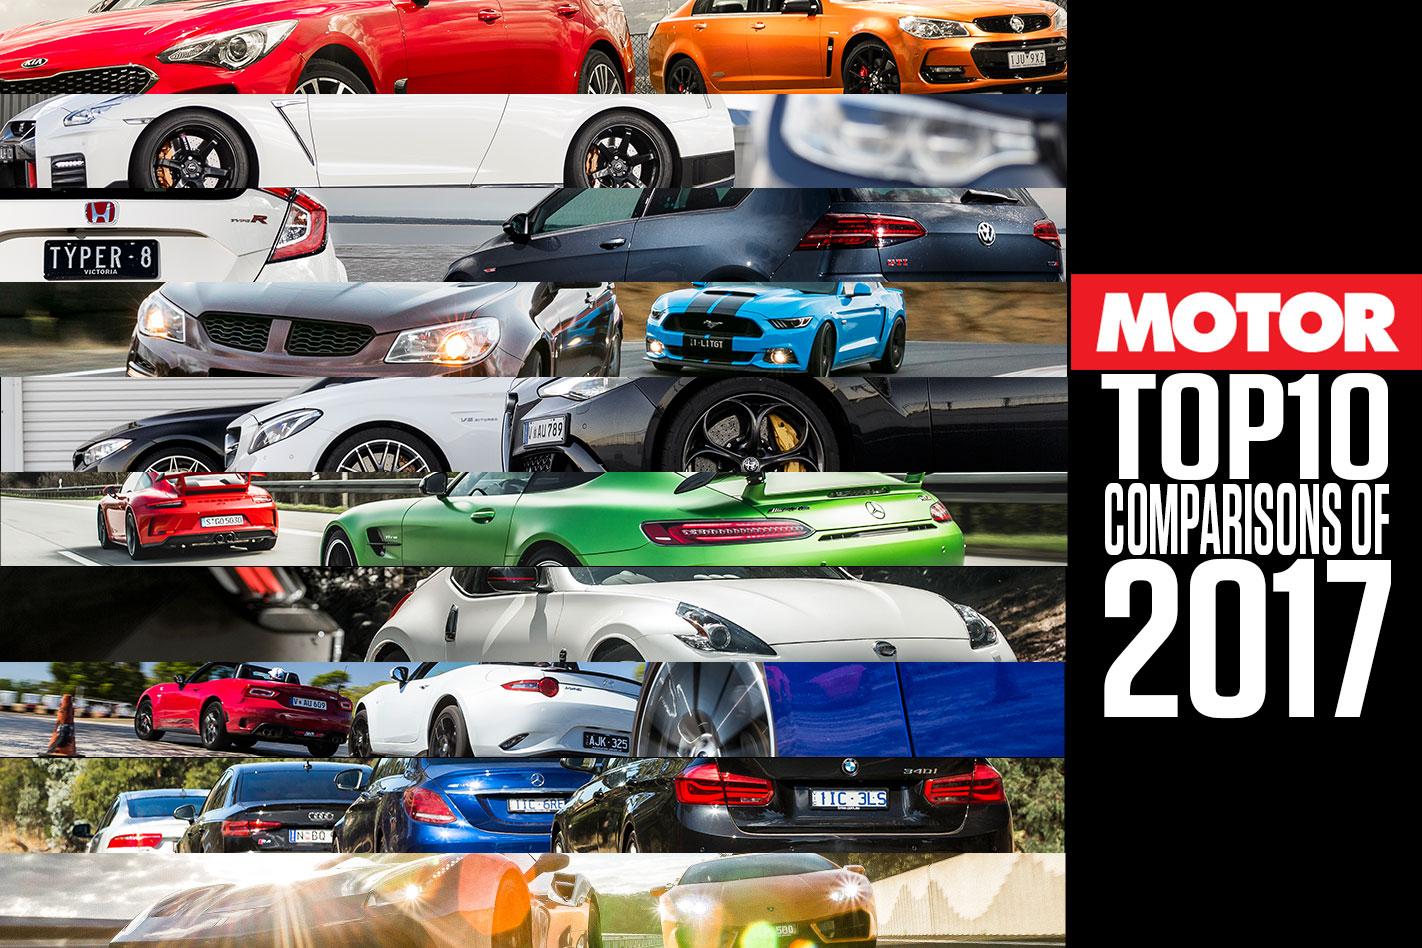 MOTOR's Top 10 Comparisons of 2017   MOTOR